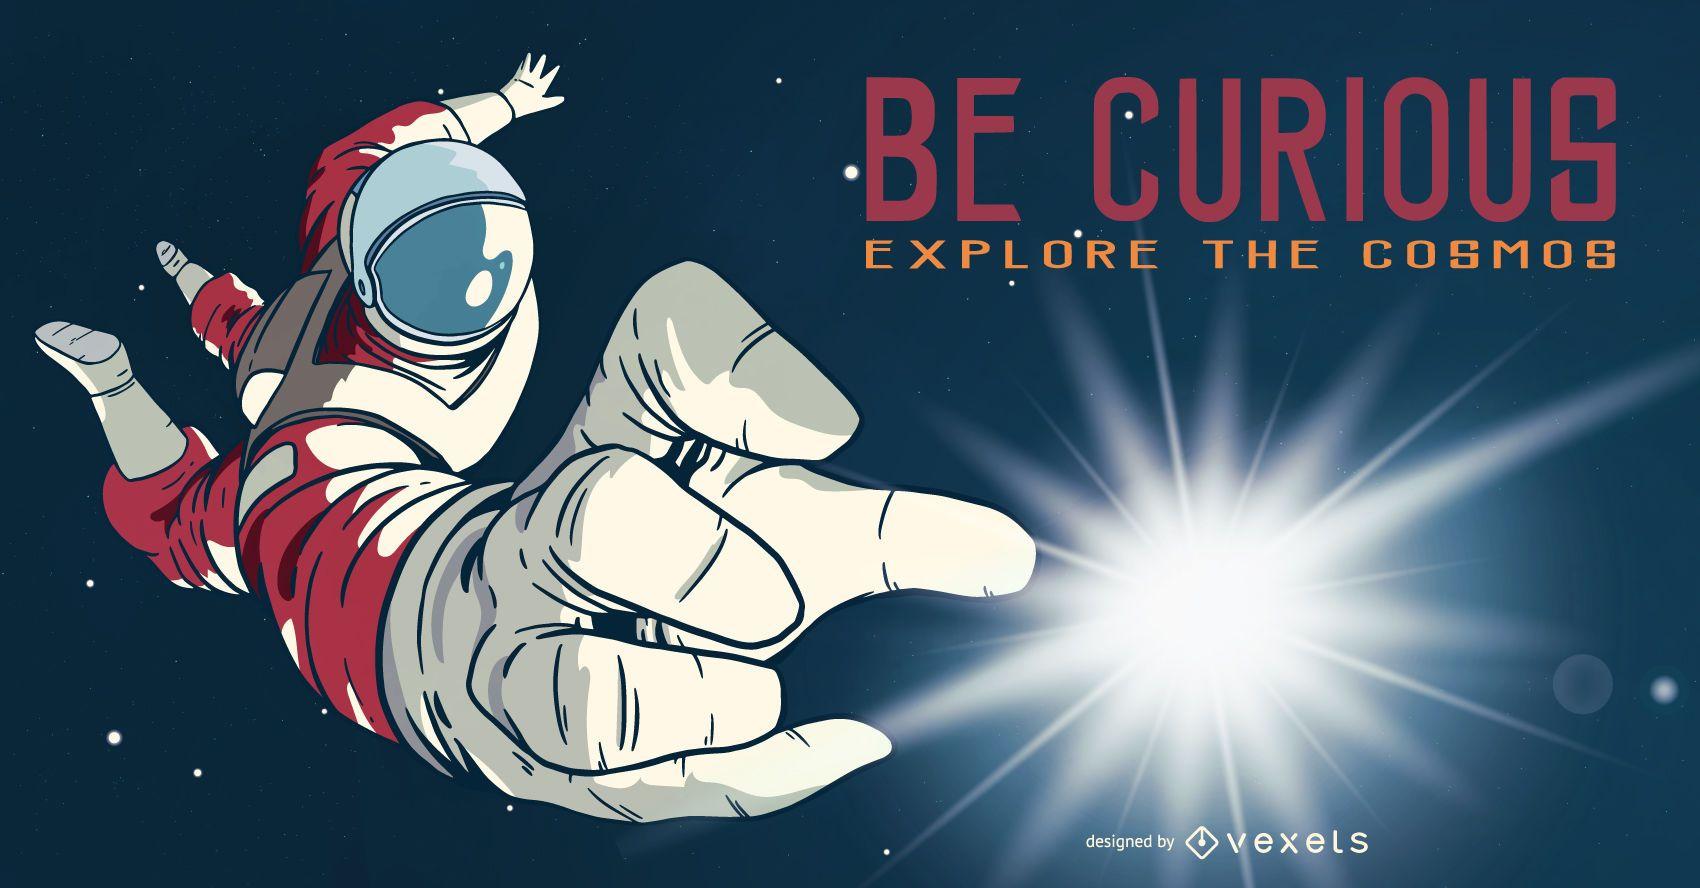 Astronaut be curious illustration